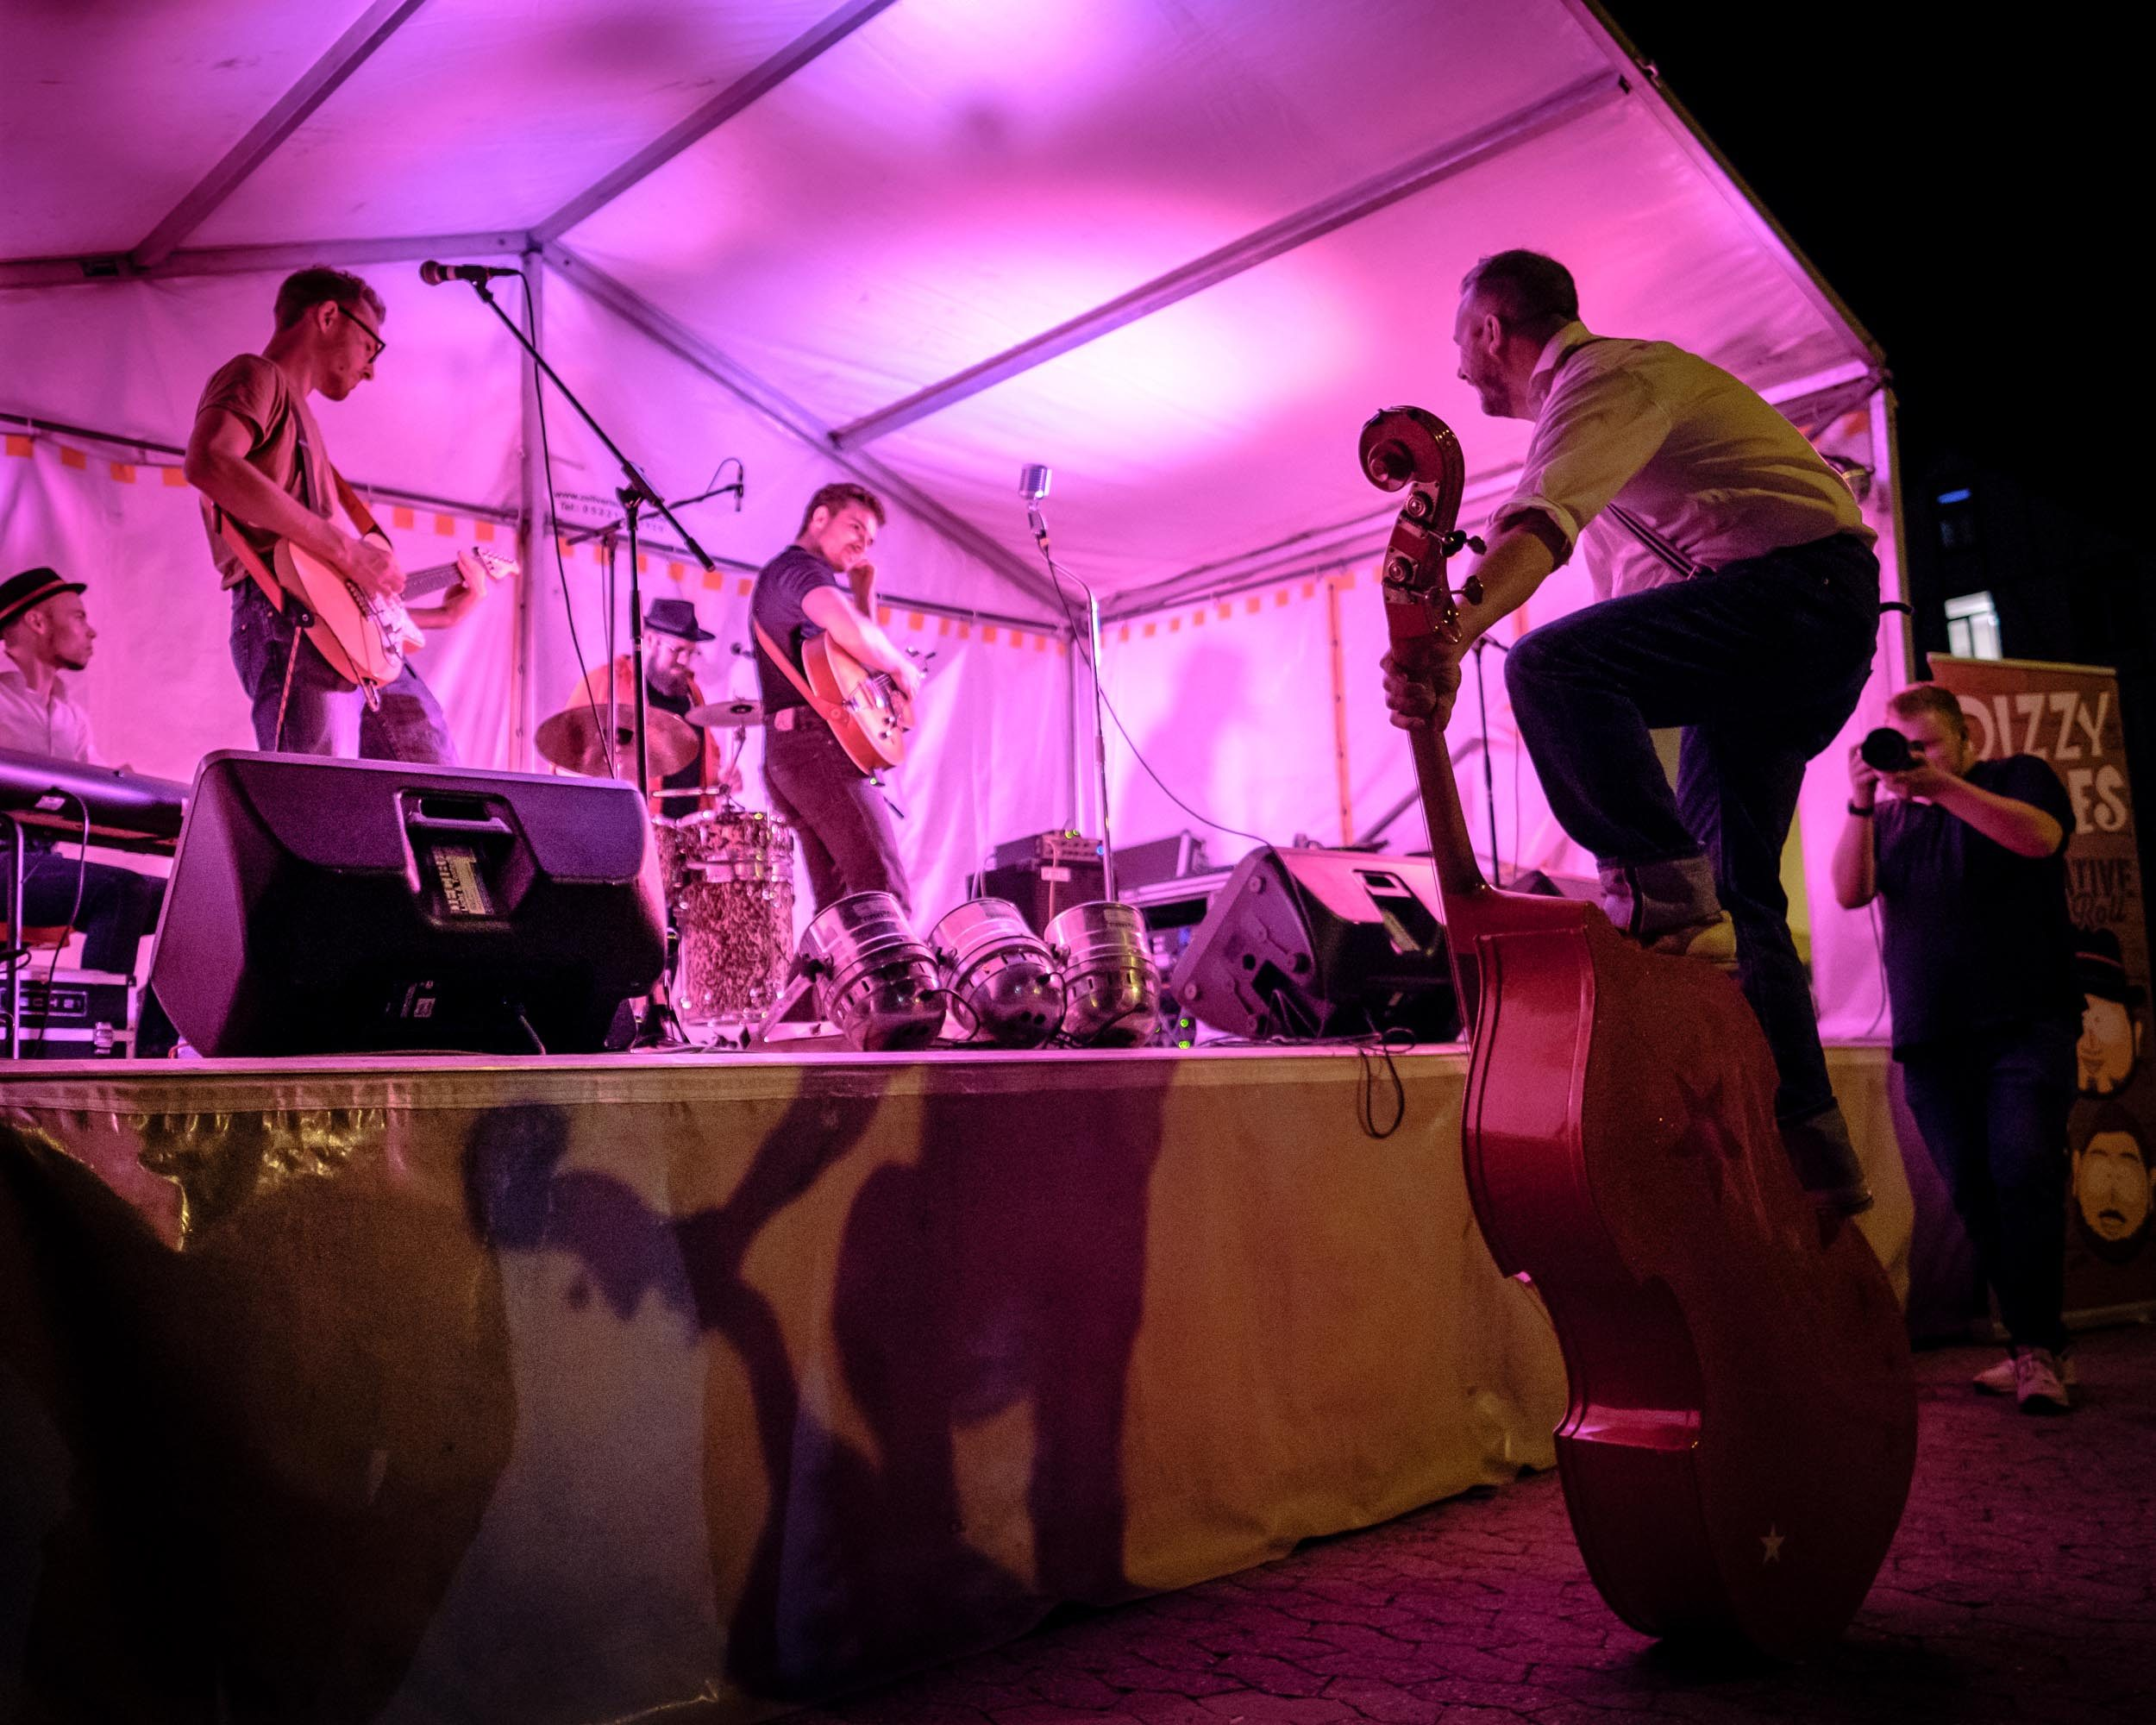 Dizzy Dudes Konzert Vlotho Herblaub&Winterfest 2019